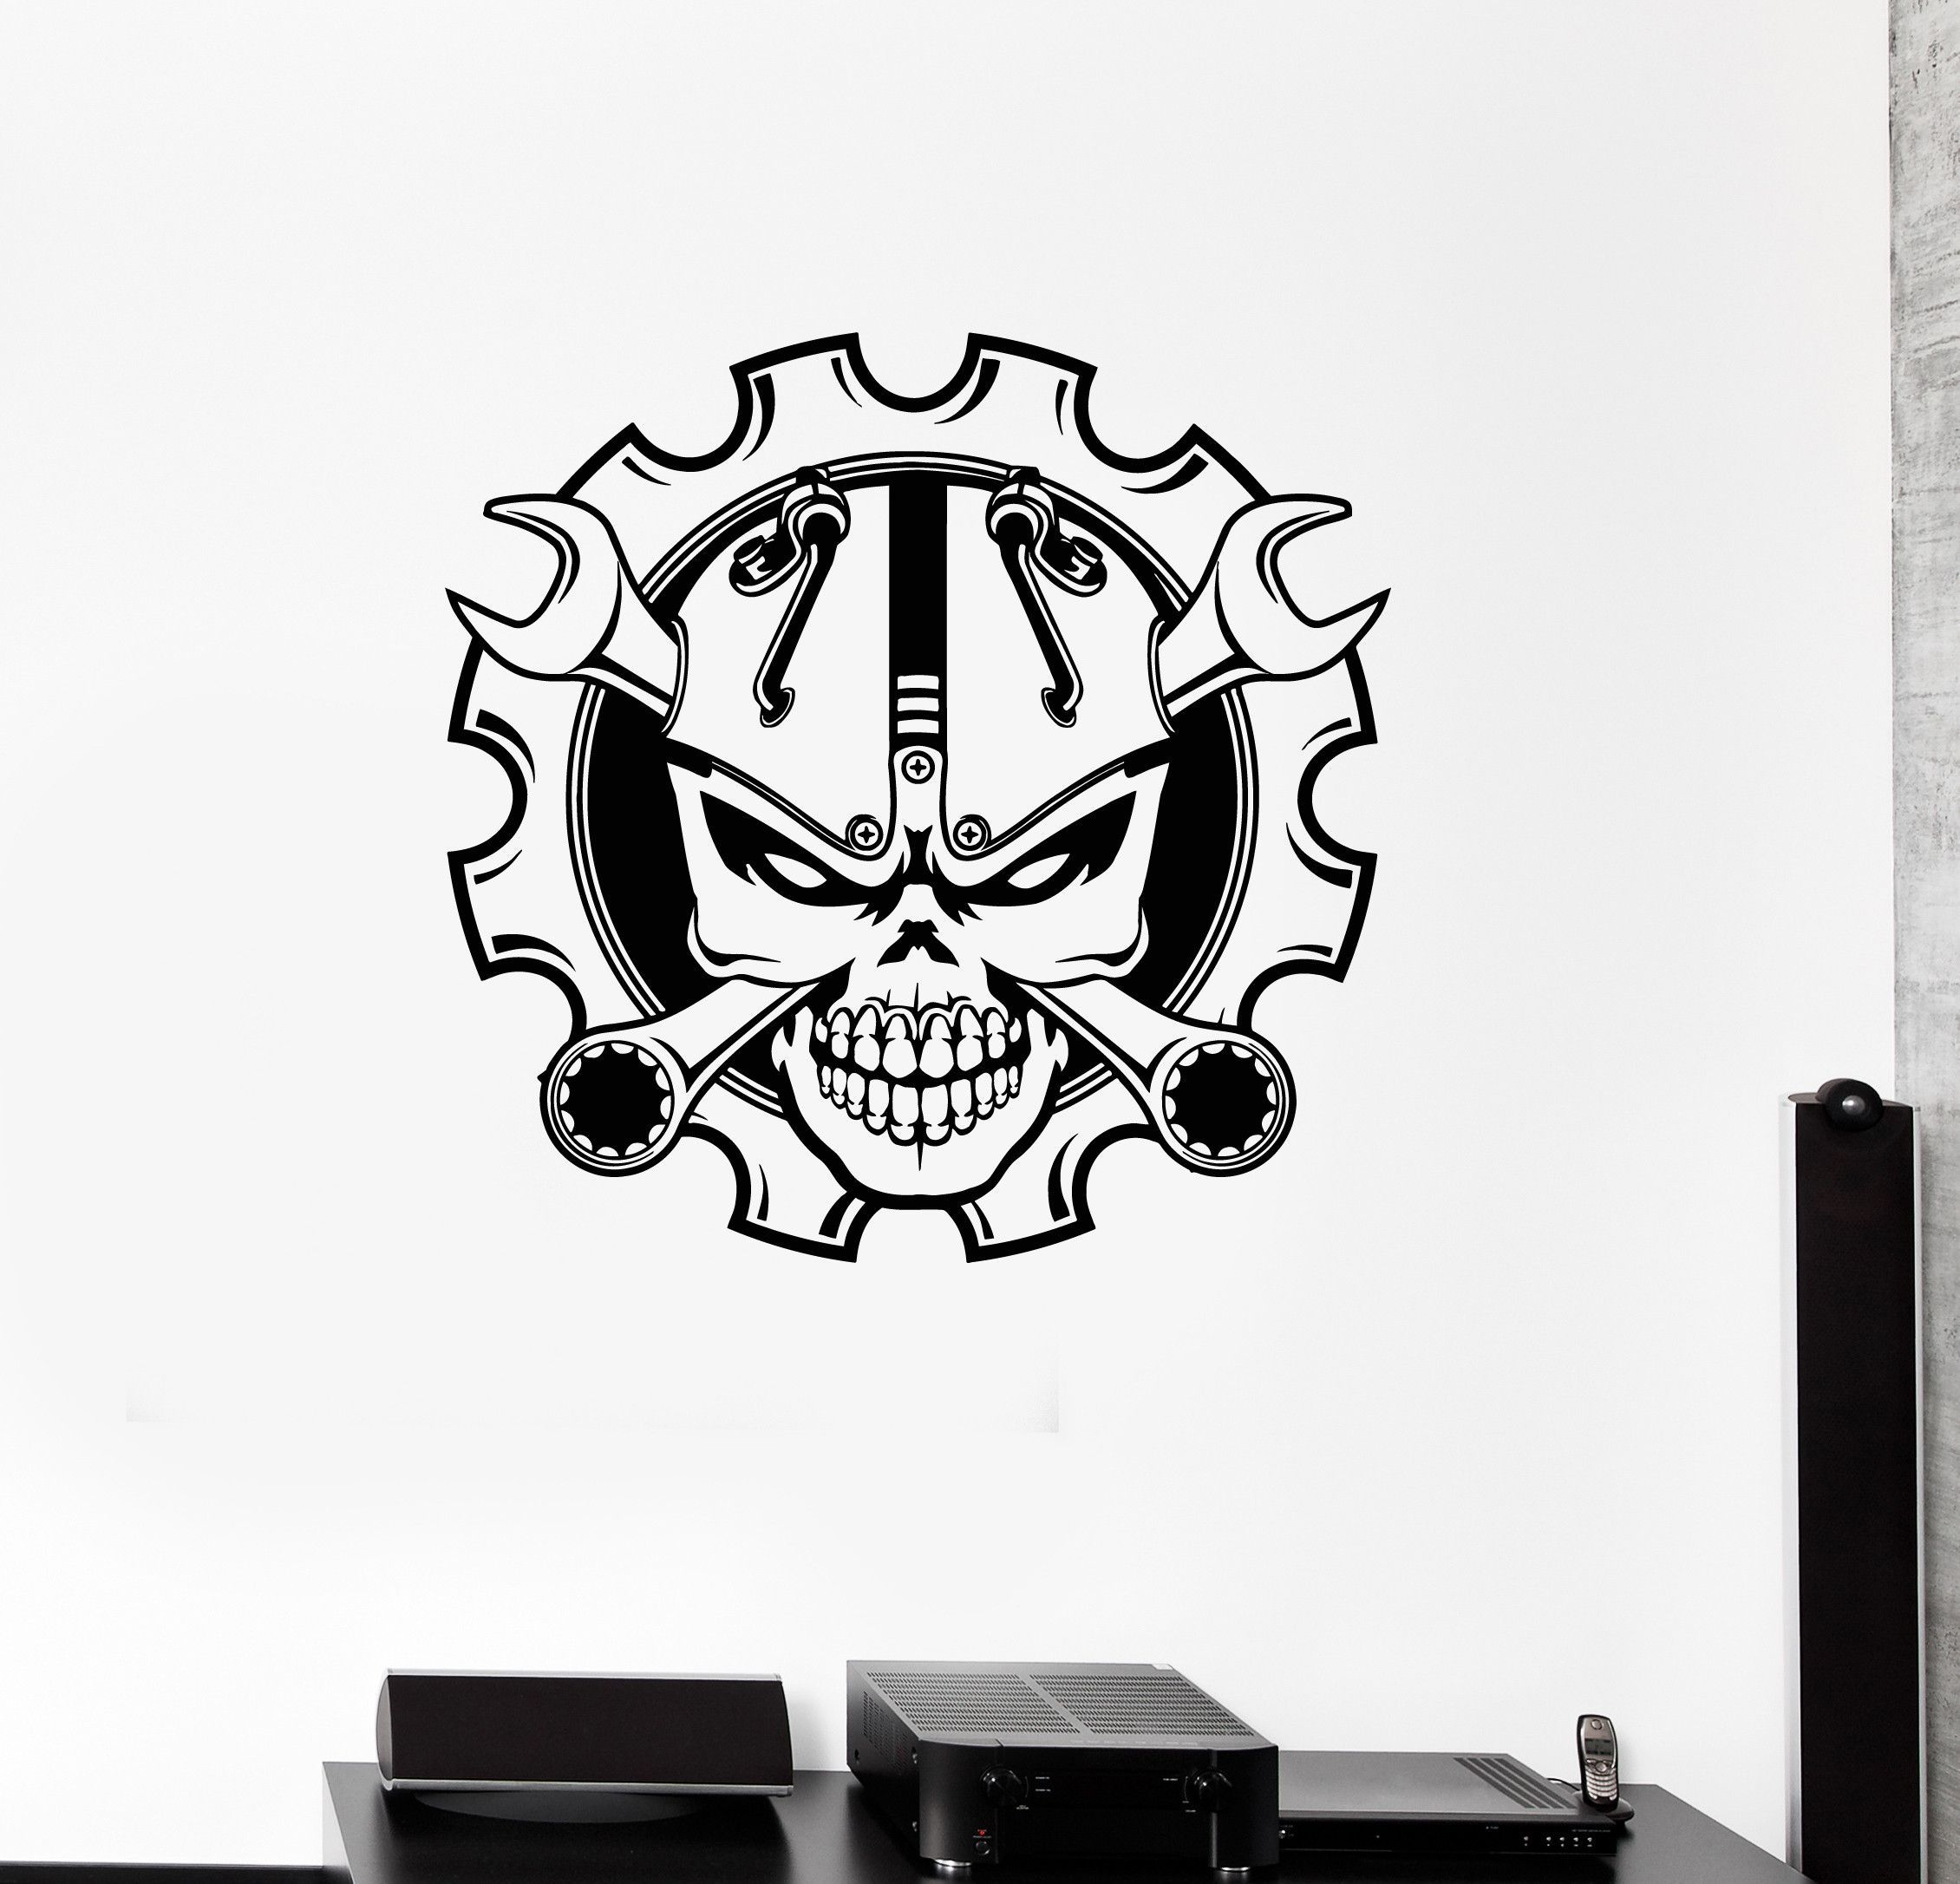 Vinyl wall decal skull wrench garage decorating idea car driver